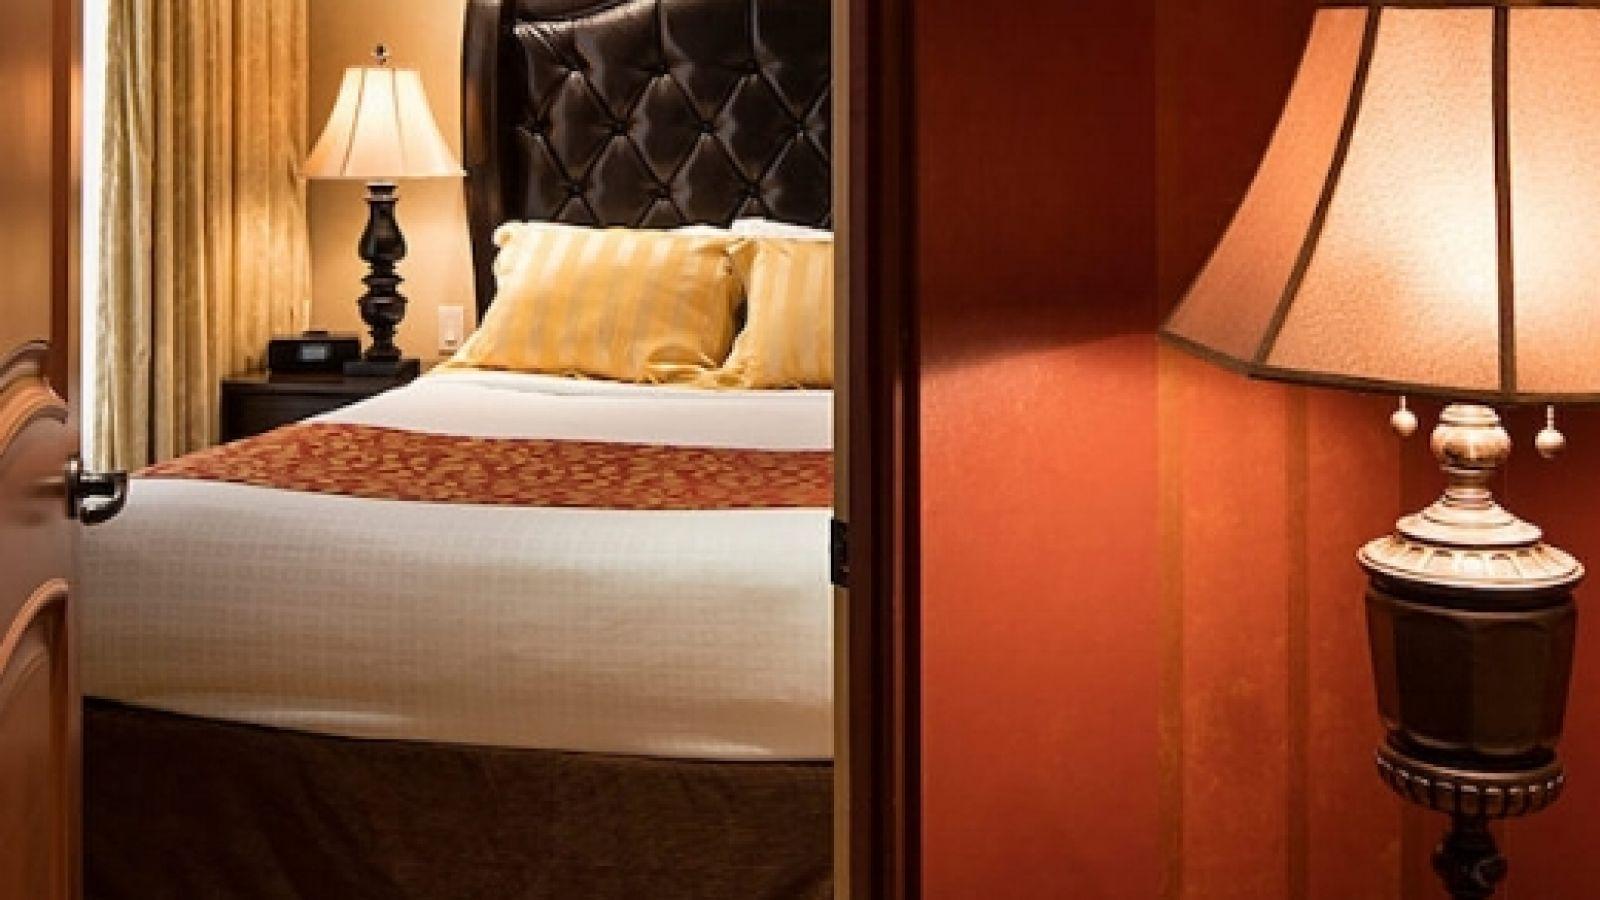 The Royal Kelowna - 1 bedroom unit